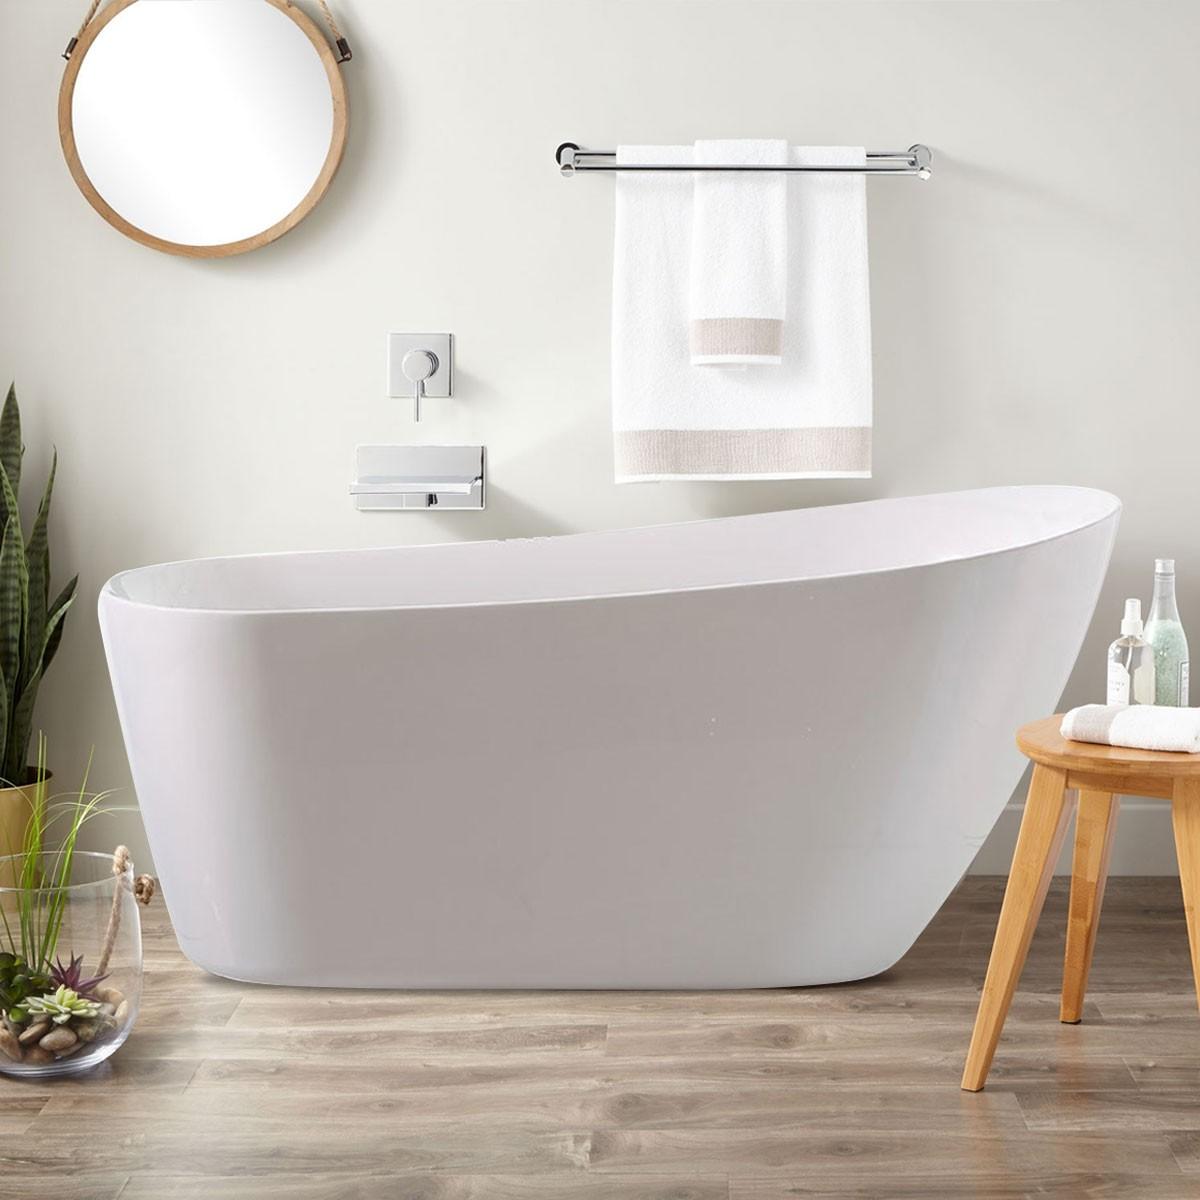 BATHPRO 59 In Freestanding Bathtub - Acrylic Pure White (DK-PW-K33572)